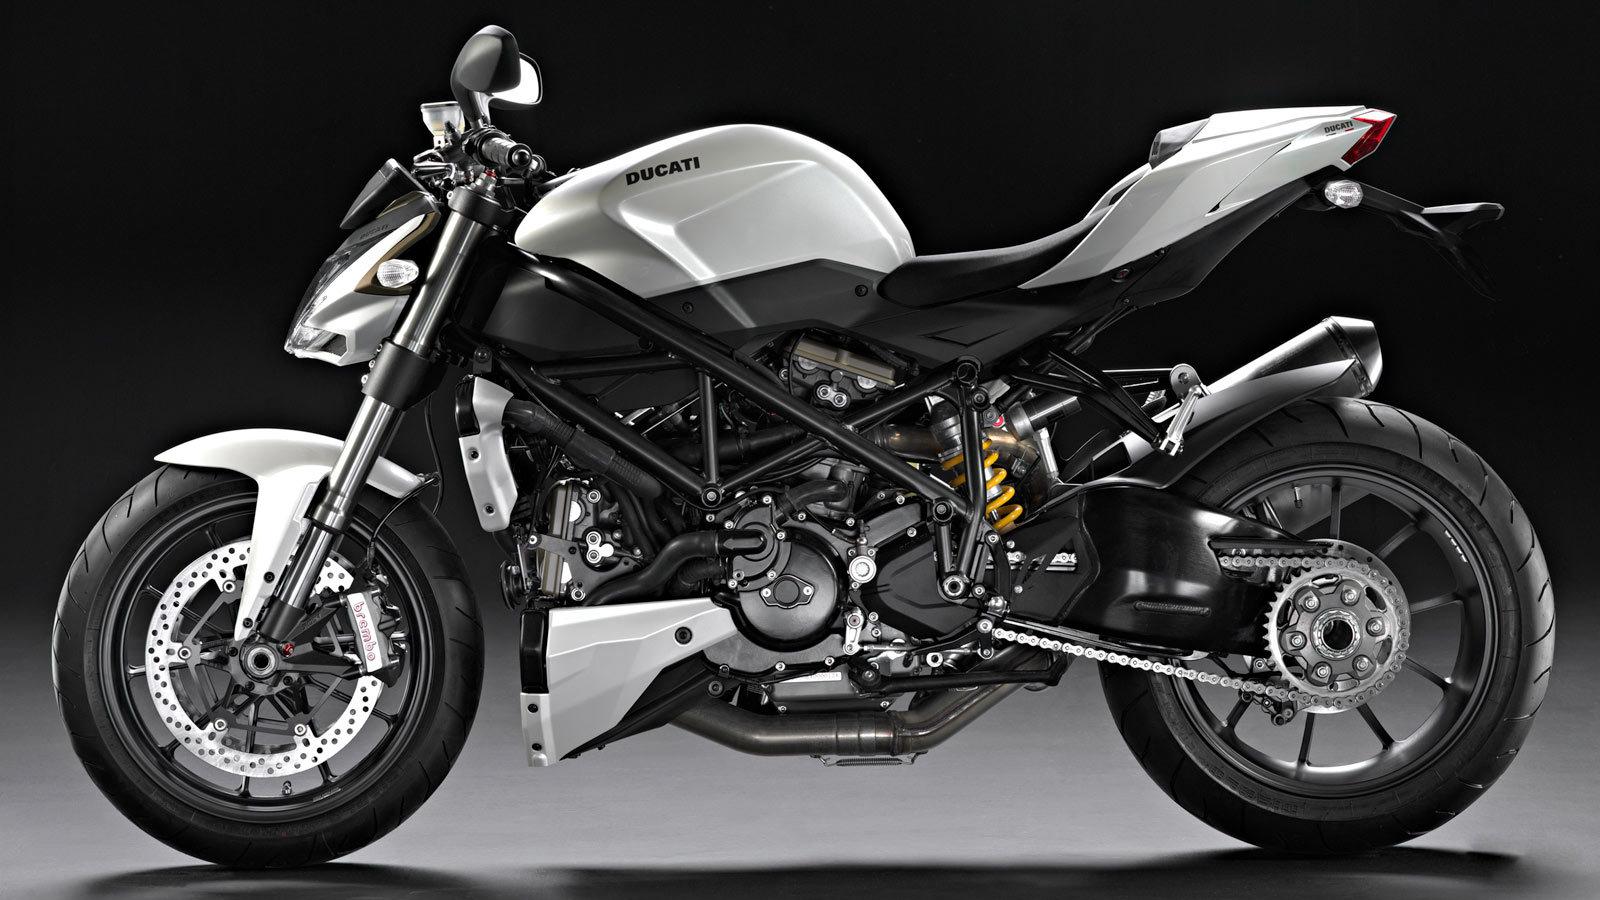 Ducati Streetfighter 1100 2